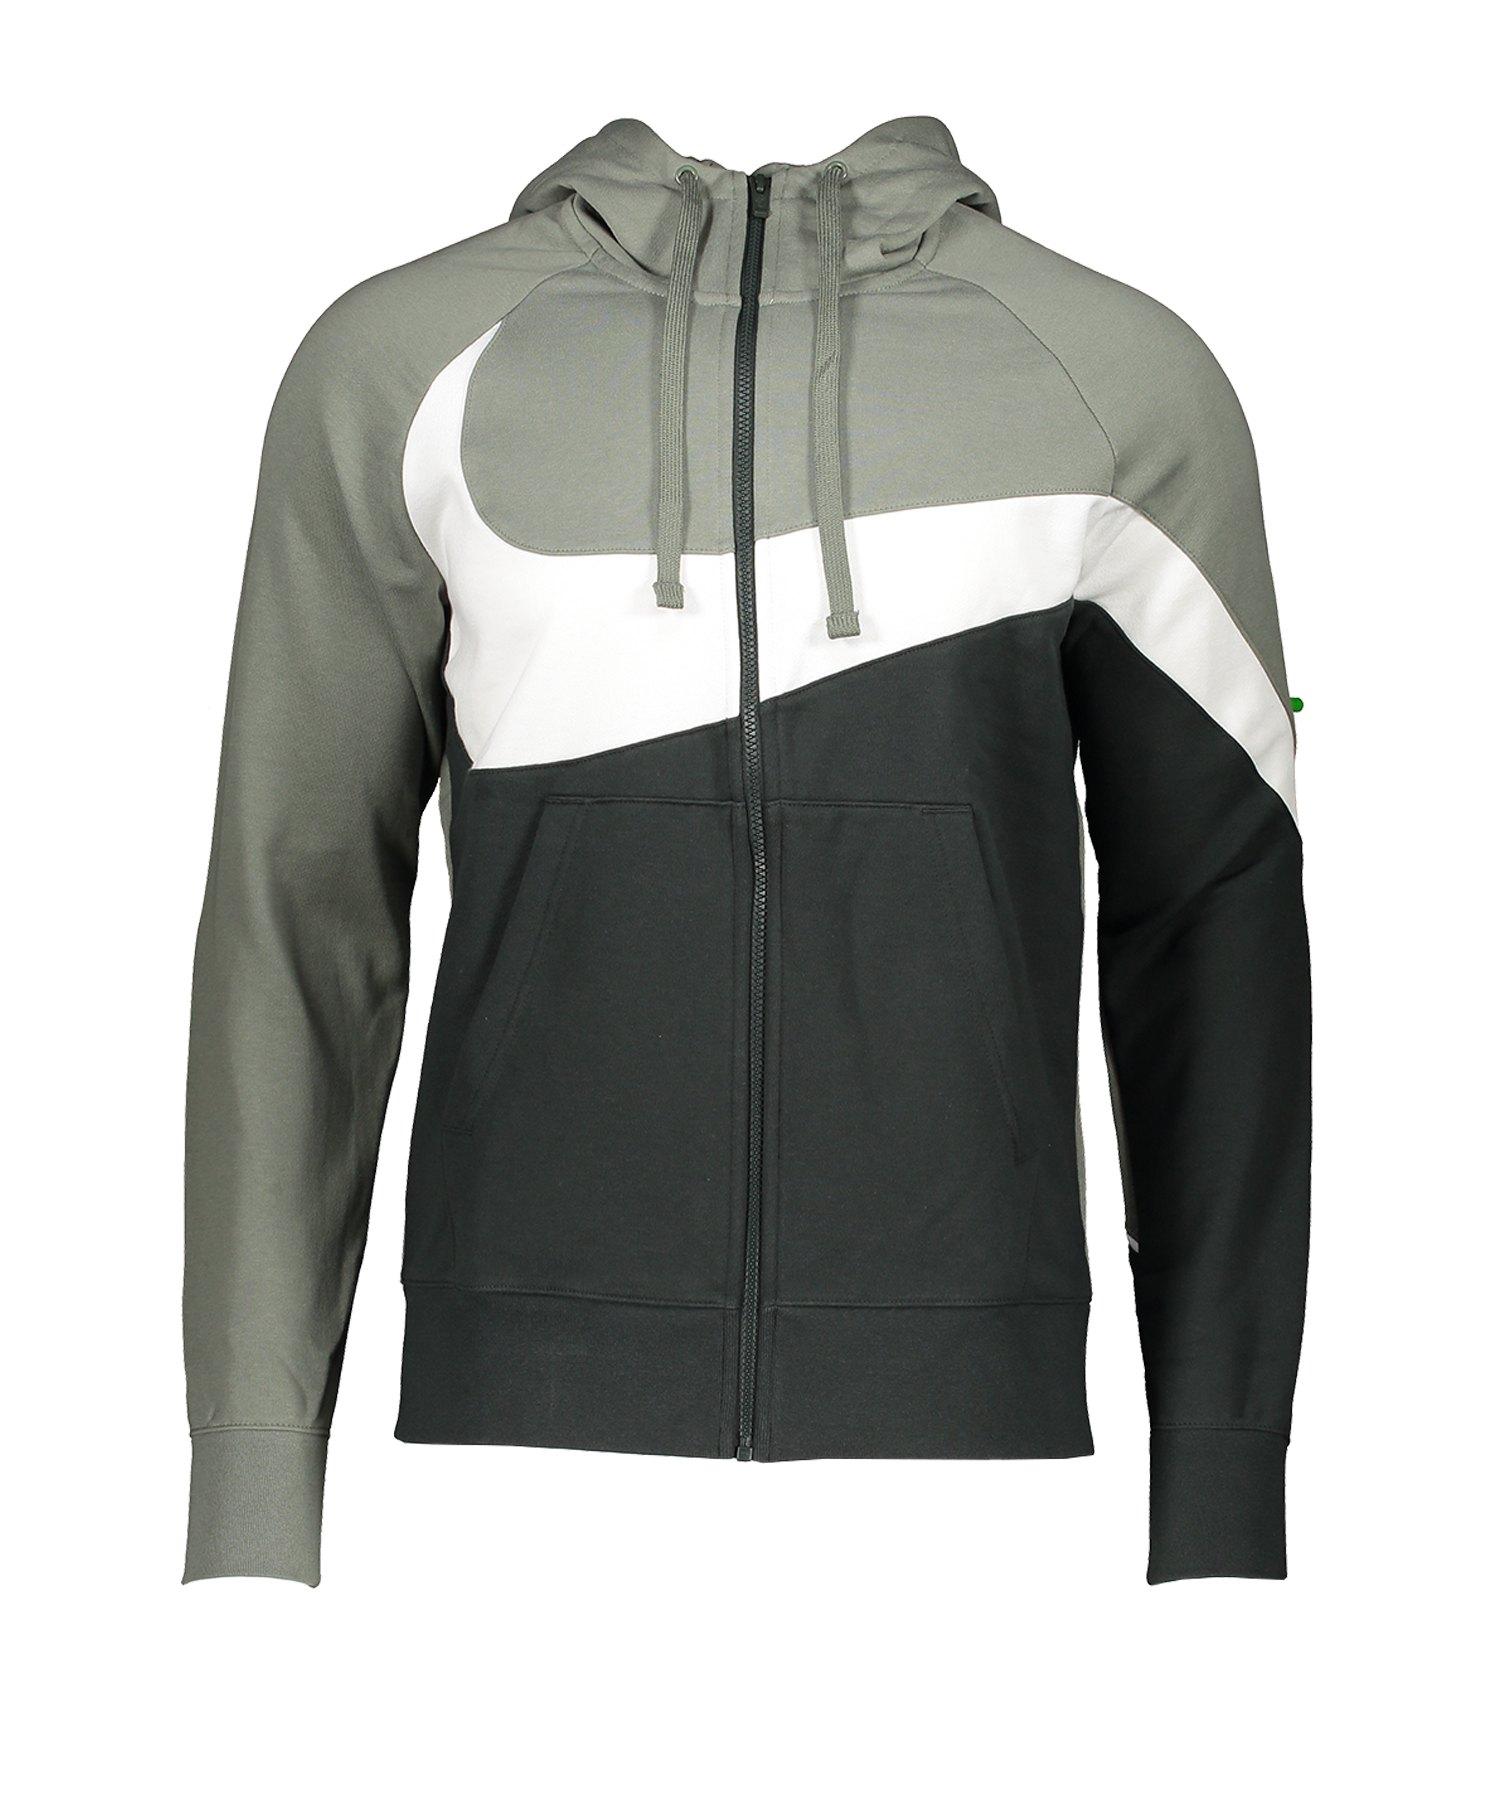 Nike Statement Fullzip Kapuzenjacke Grün F351 - gruen